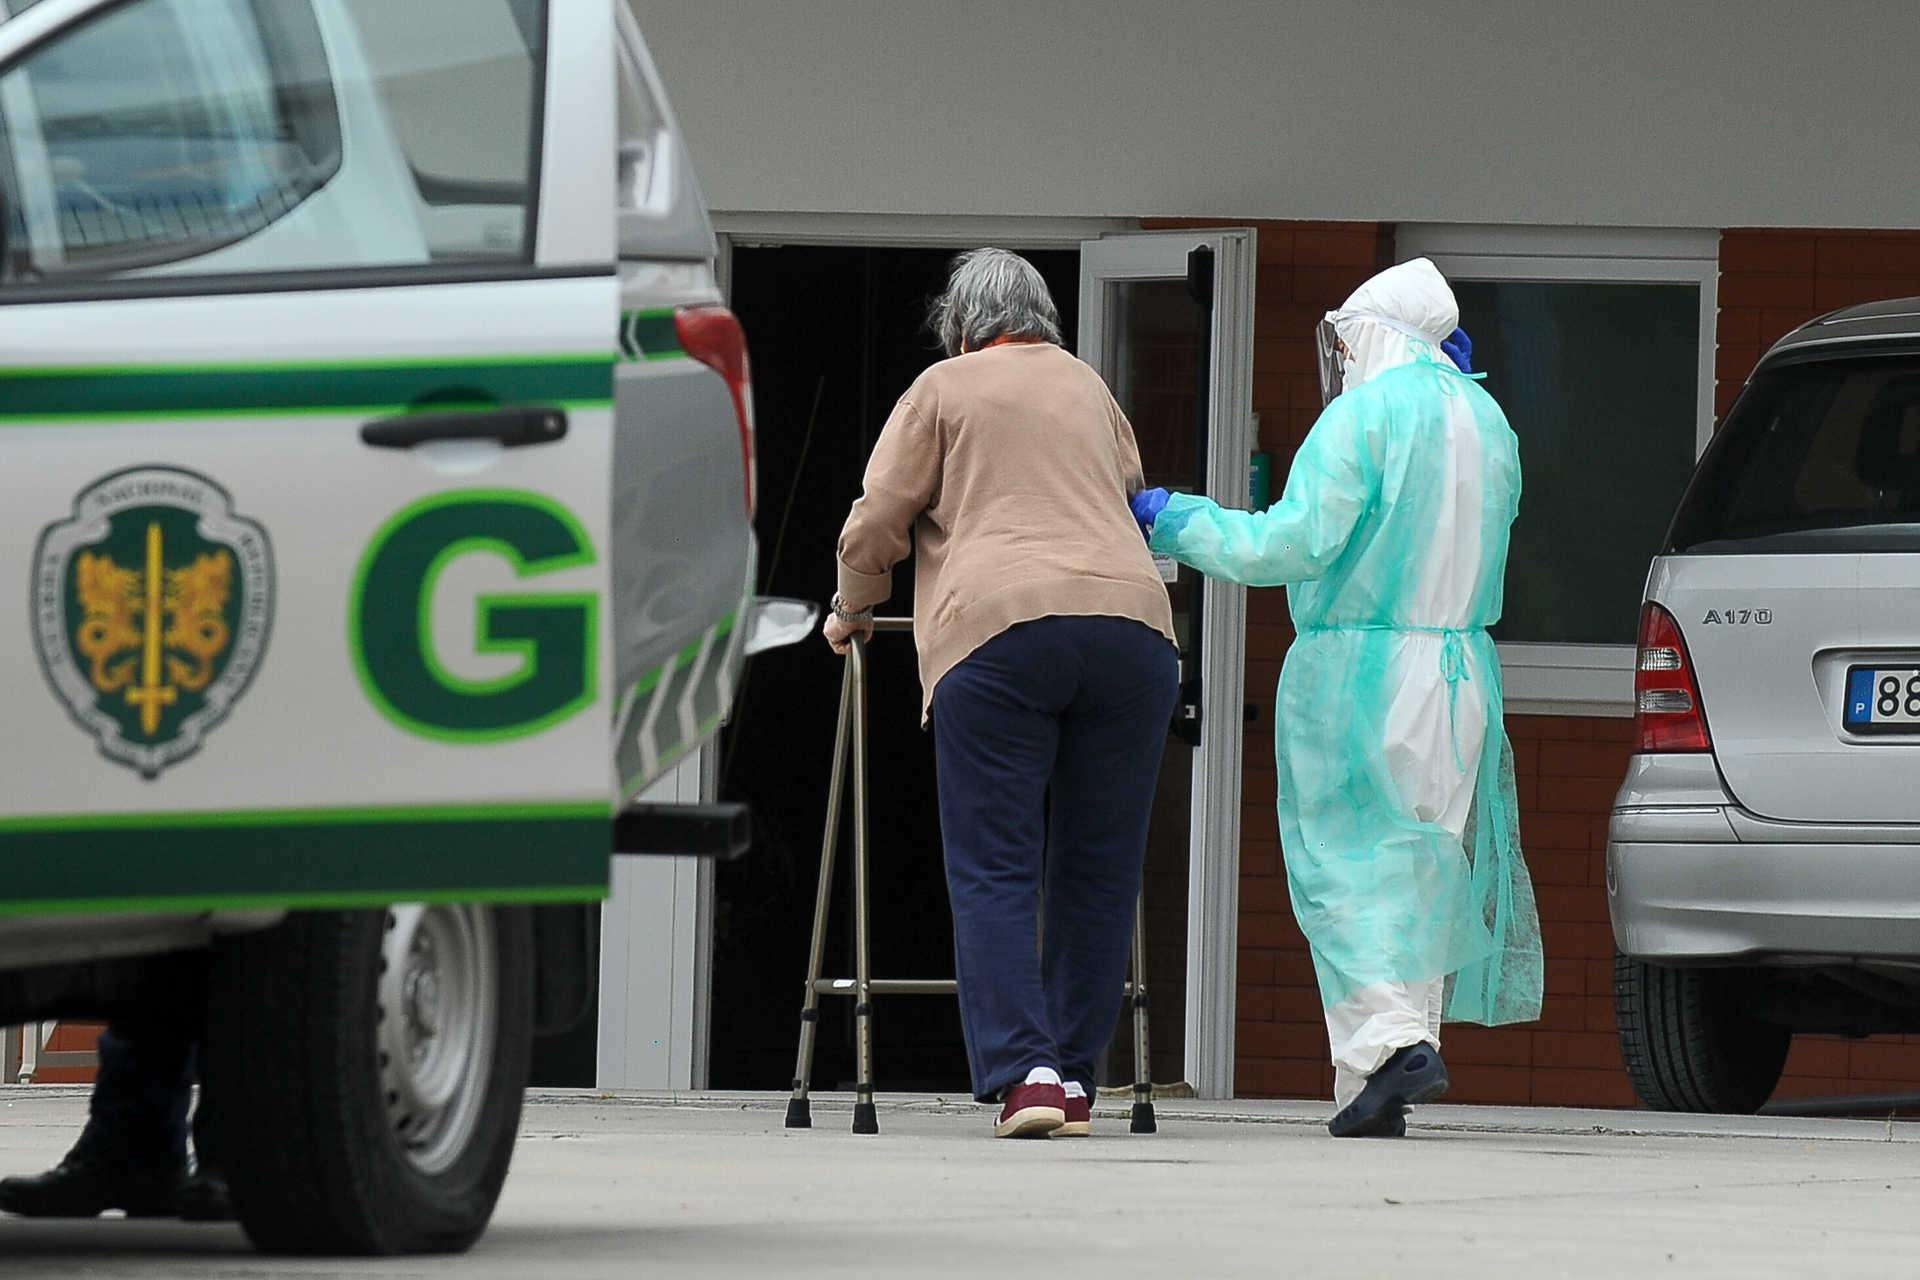 allbet gmaing官网:葡萄牙一养老院发生群集性熏染 45位老人确诊